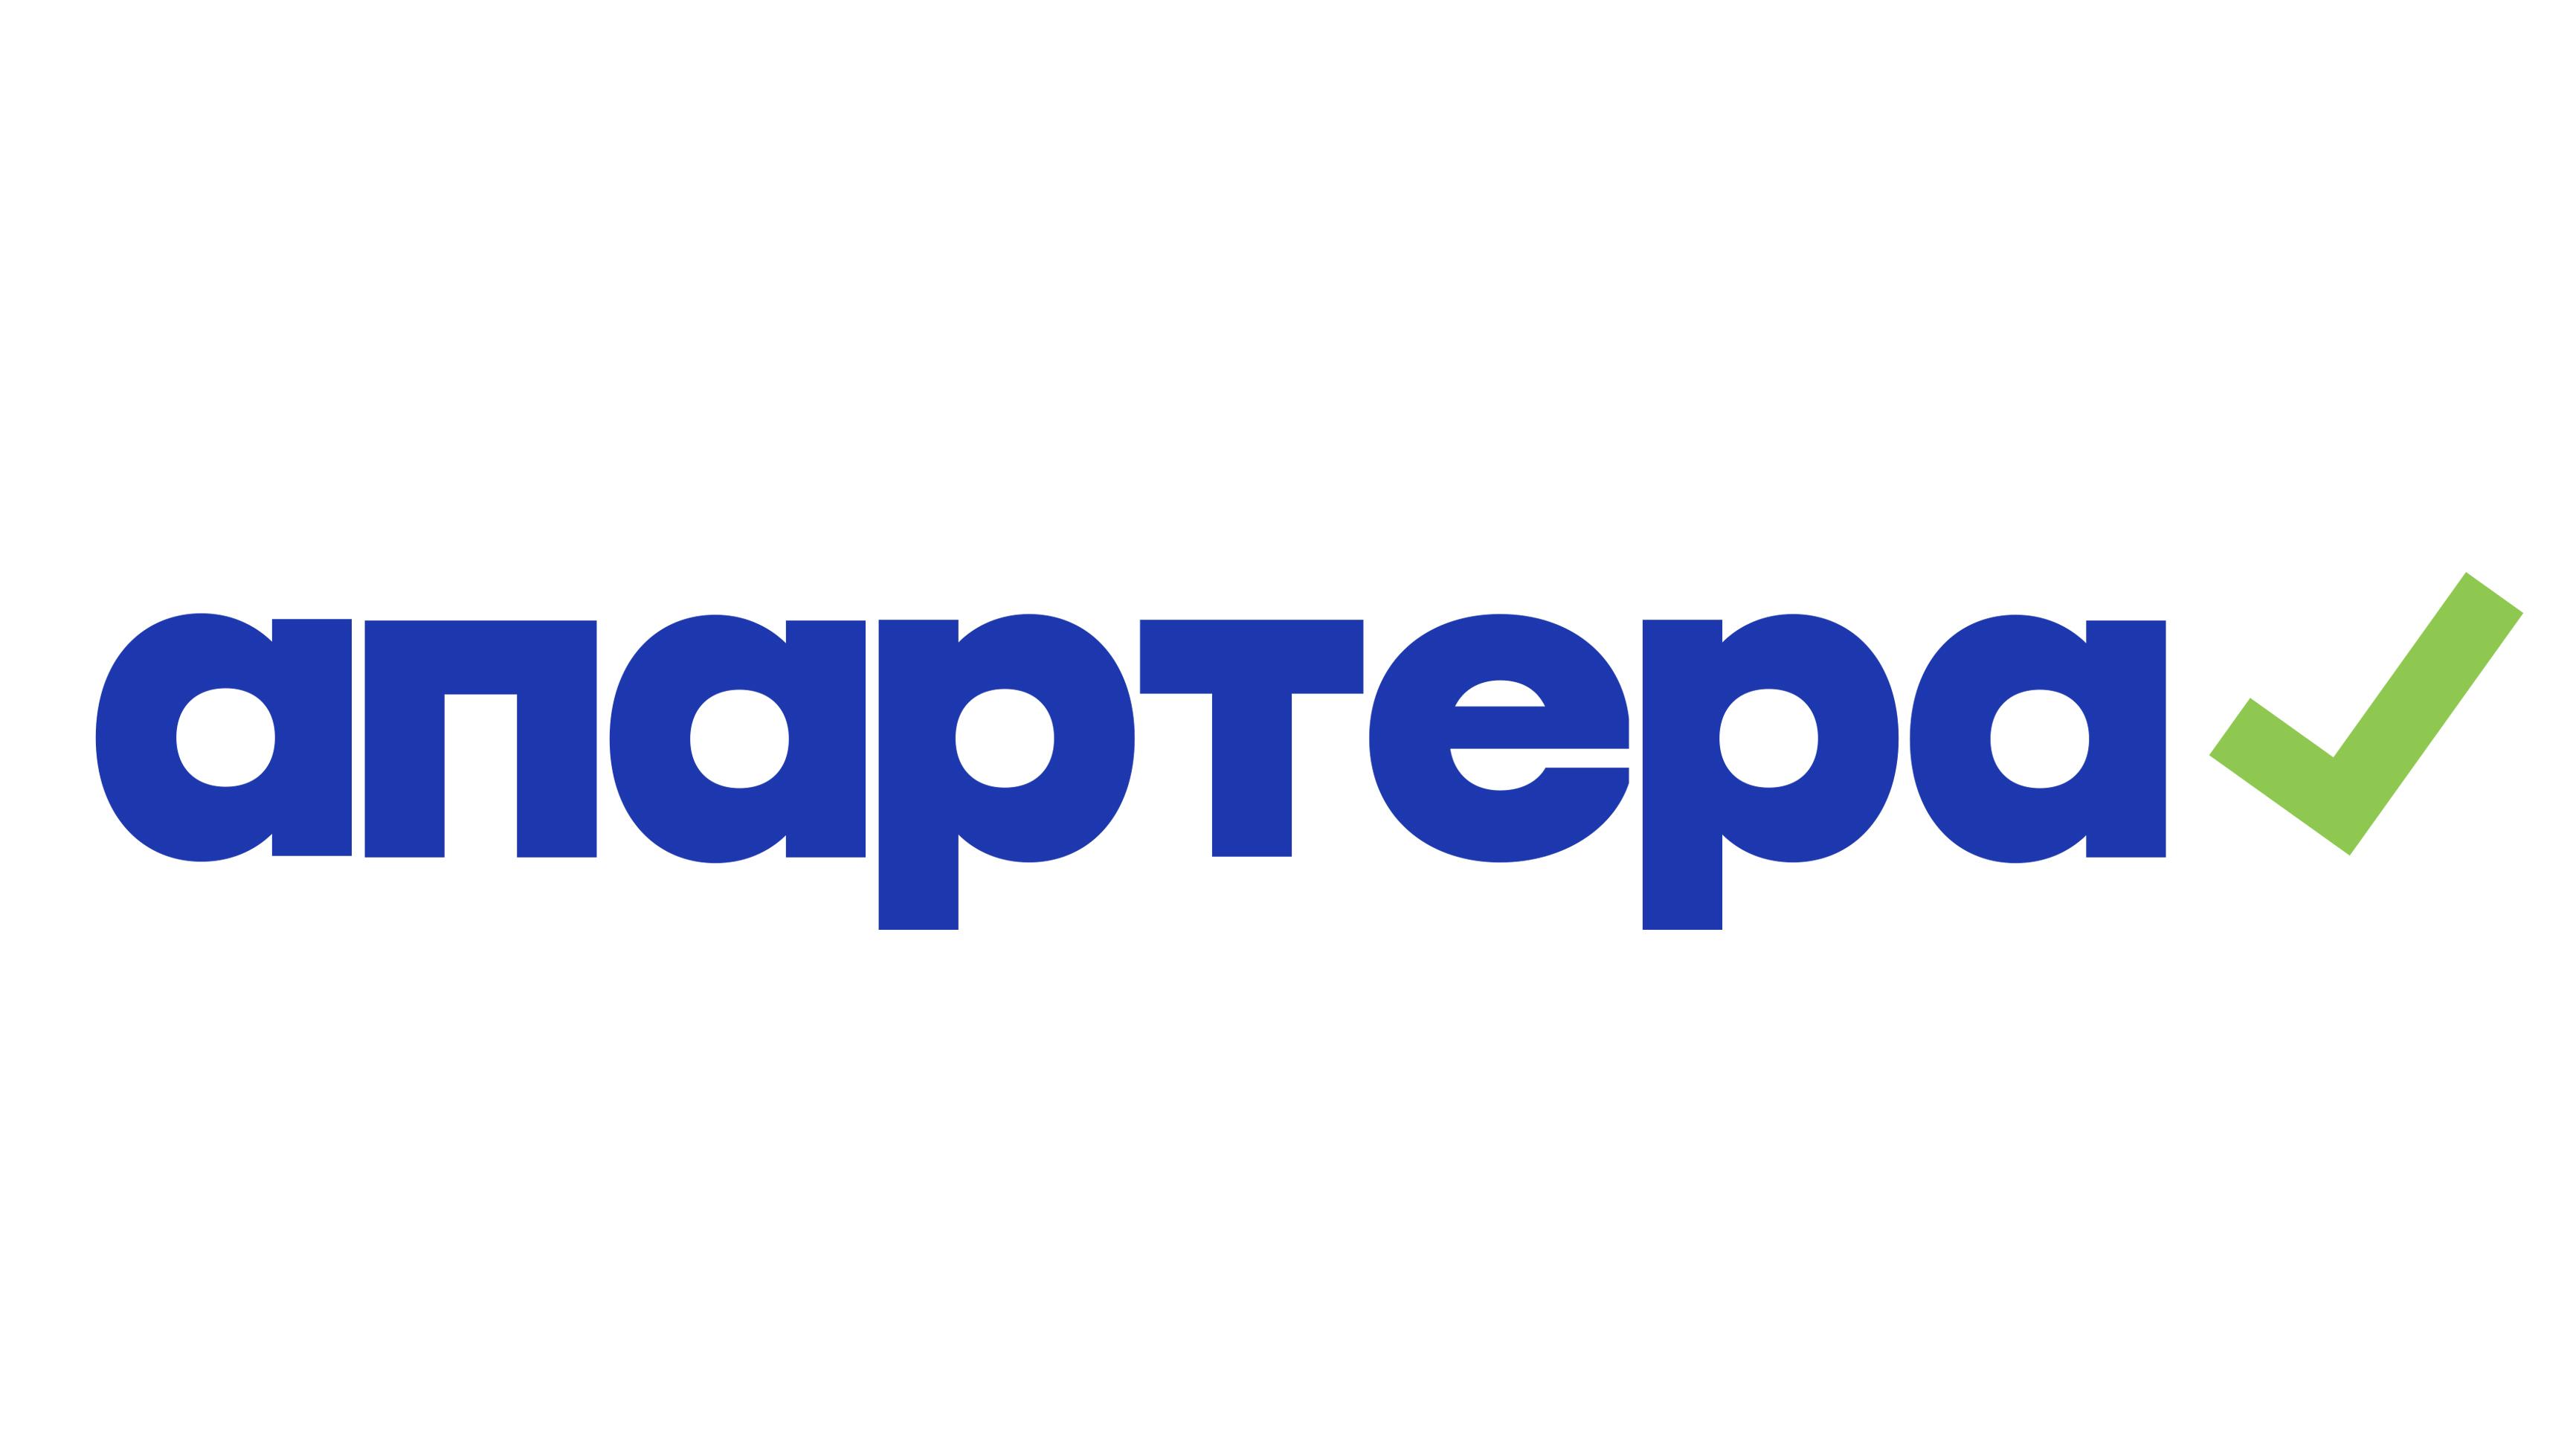 Логотип для управляющей компании  фото f_6425b7d316119e0e.jpg